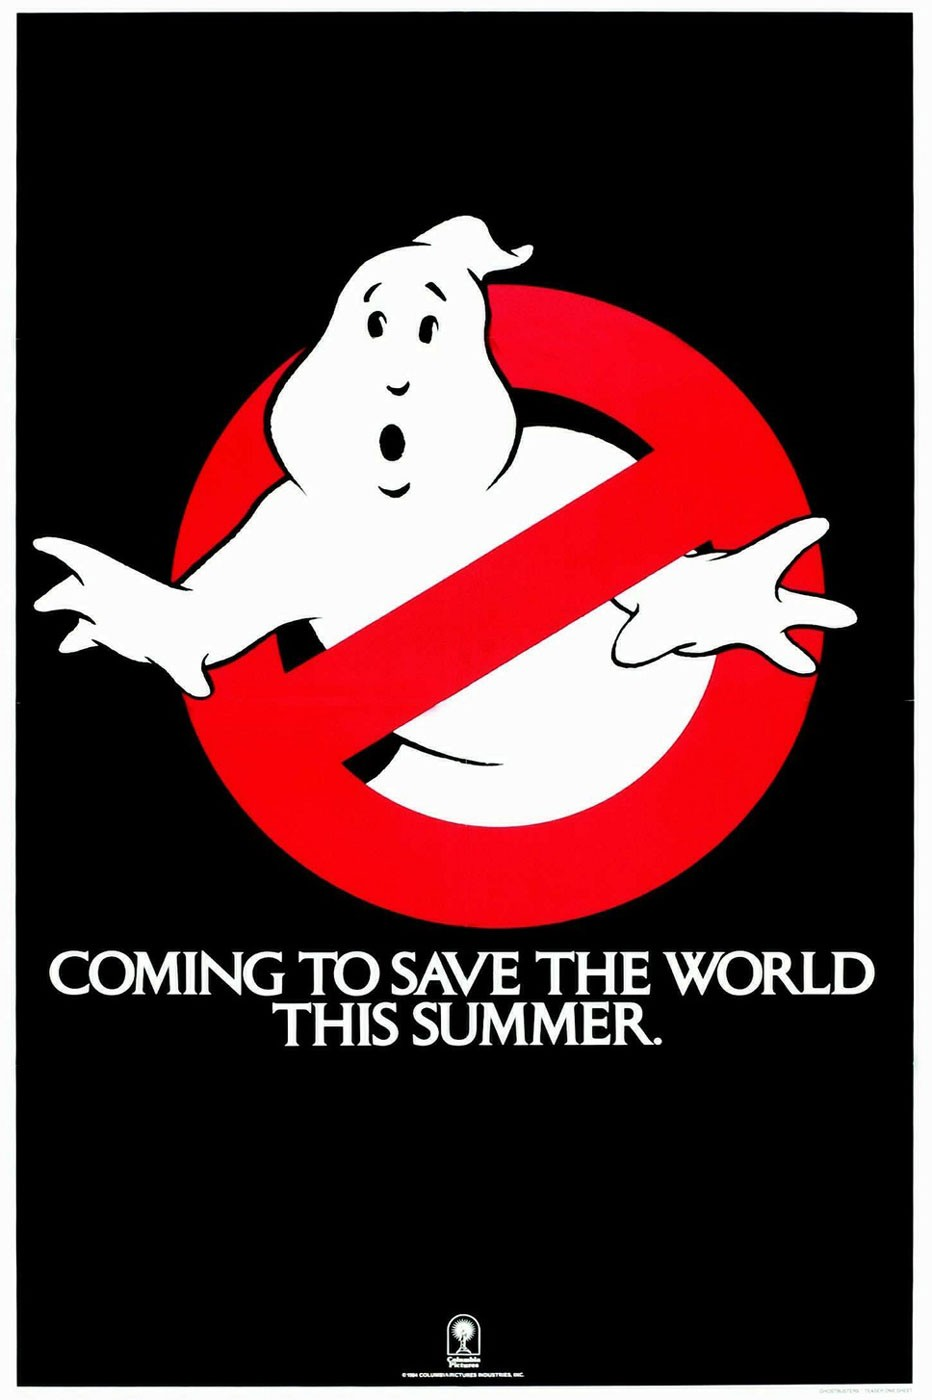 Película - Ghostbusters - Ivan Reitman (1984)